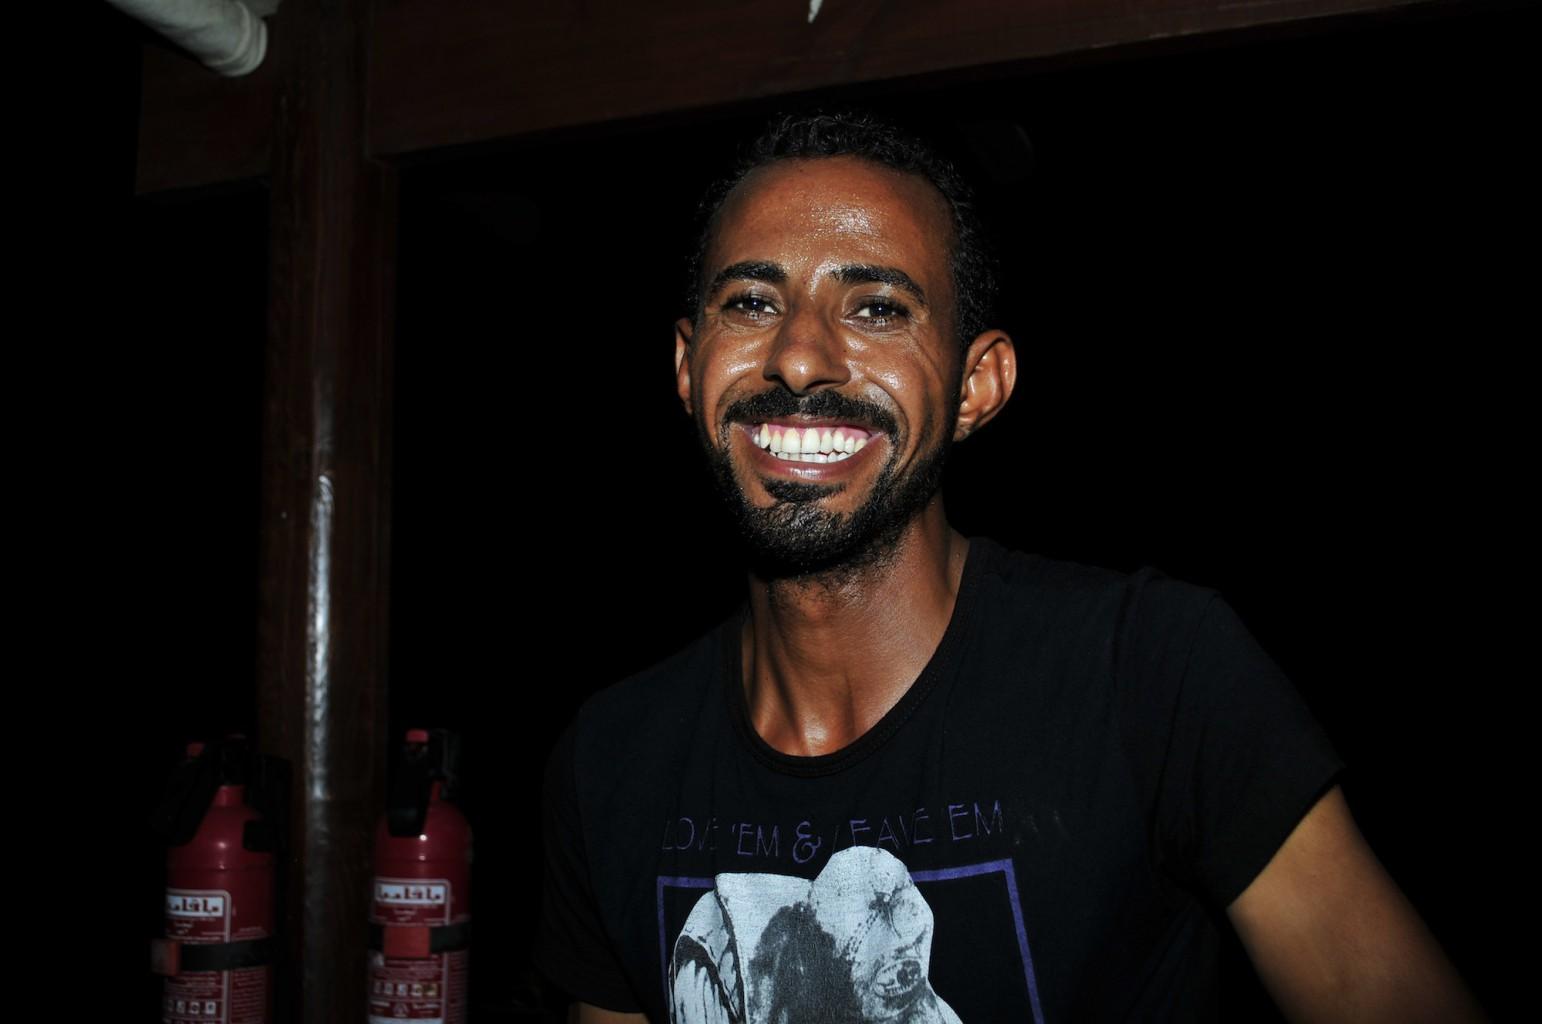 Hassan, good People of Egypt